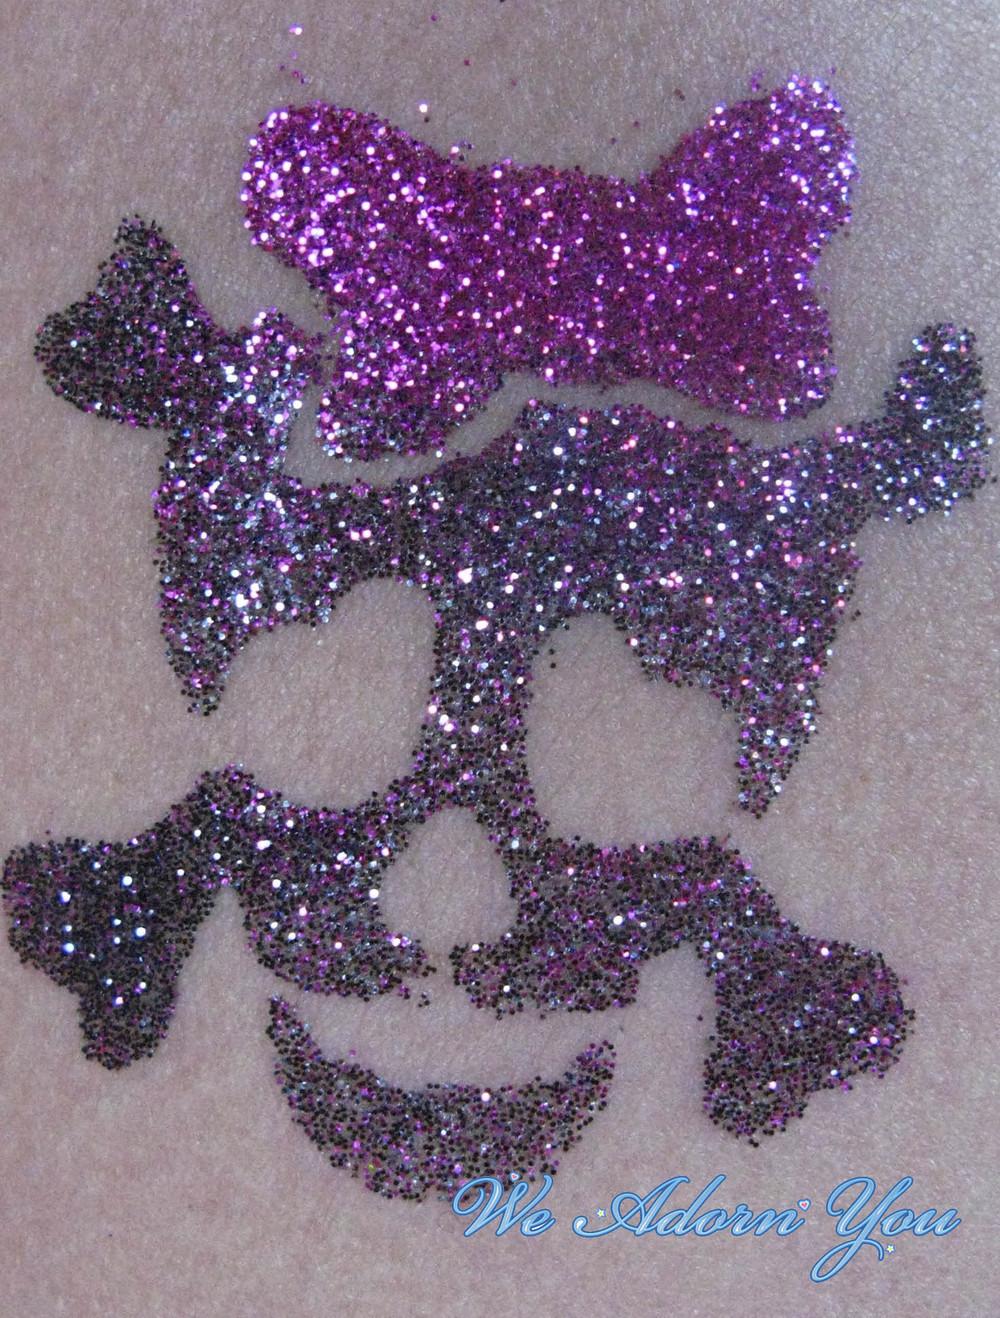 Glitter Tattoo Skull and Crossbones- We Adorn You.jpg